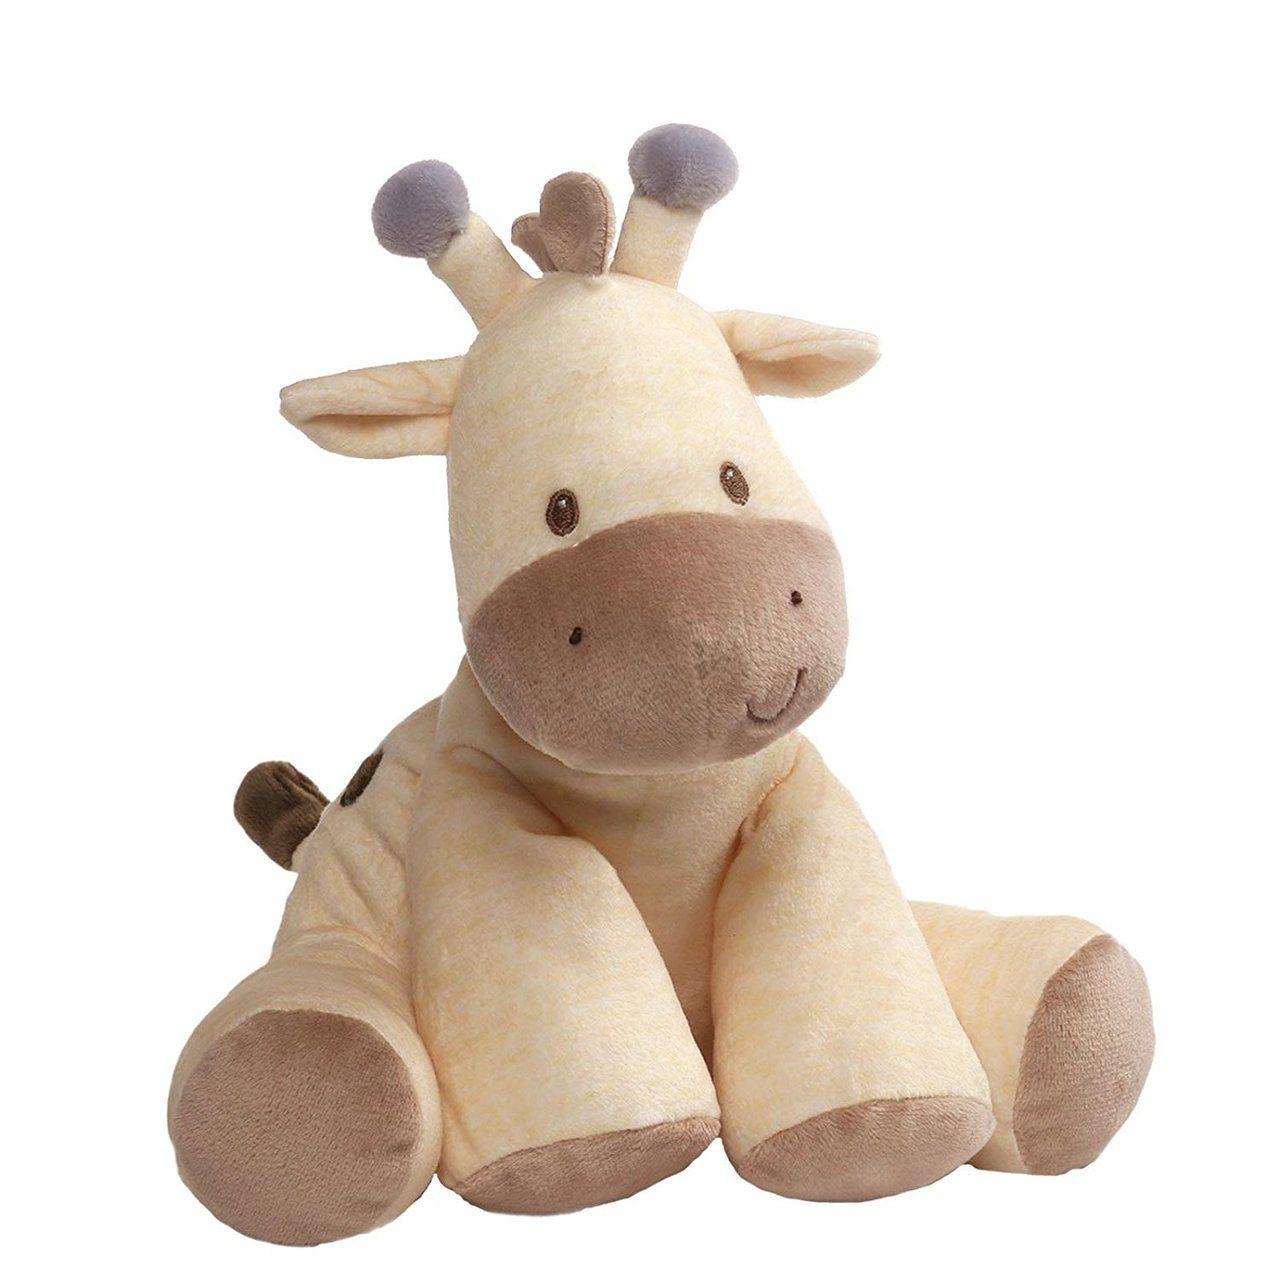 baby gund playful pals musical keywind stuffed animal plush toy giraffe 8 inches. Black Bedroom Furniture Sets. Home Design Ideas